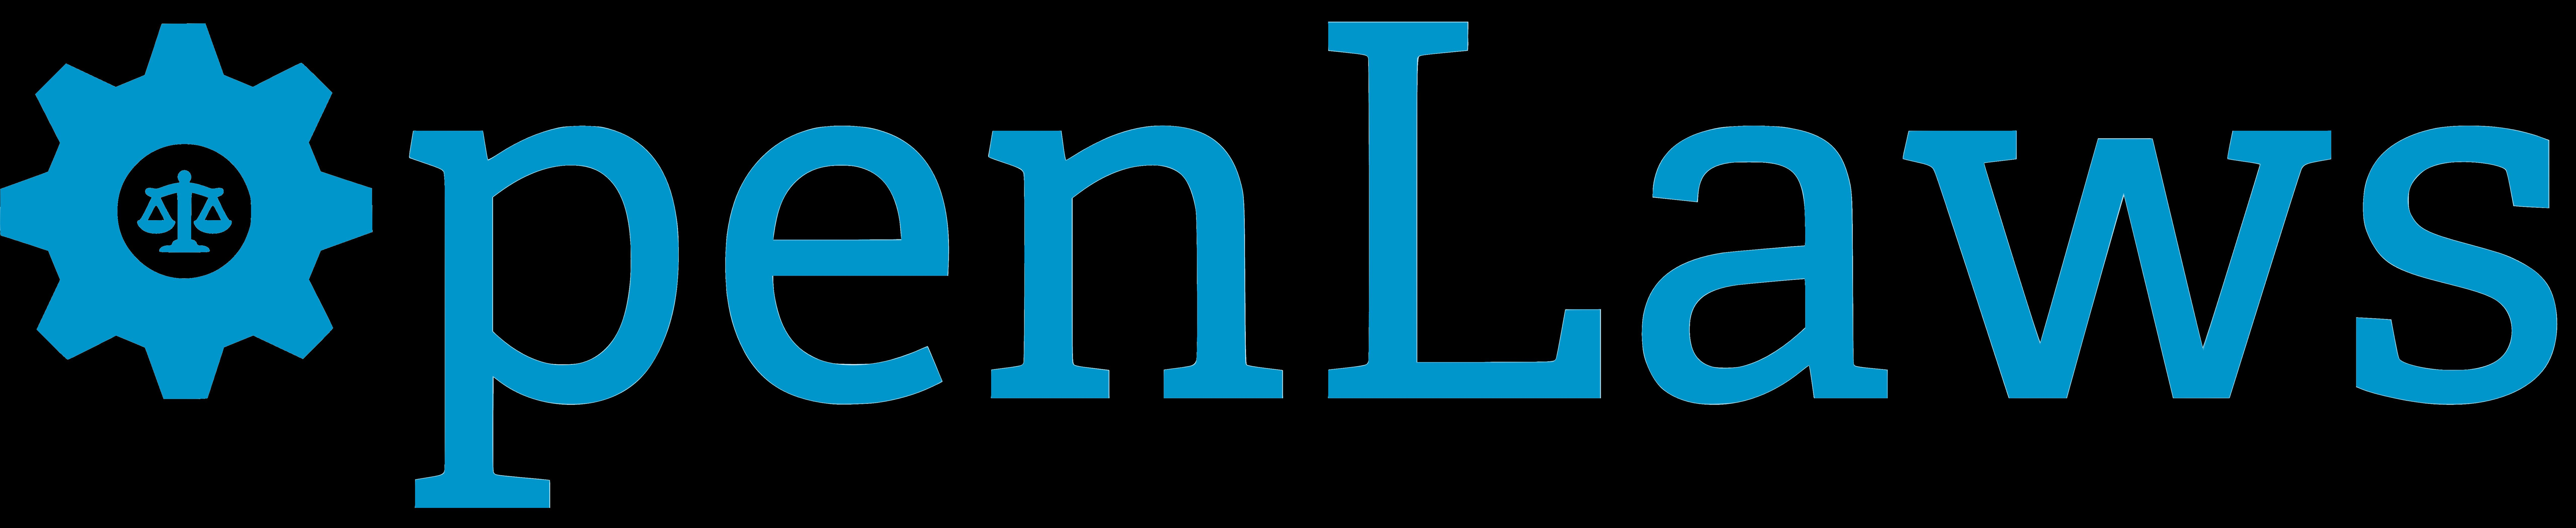 OpenlawsGR: Έρευνα από το τμήμα Μηχανικών Η/Υ και Πληροφορικής του Πανεπιστήμιου Πατρών για την αυτοματοποίηση της διαδικασίας ενοποίησης της νομοθεσίας